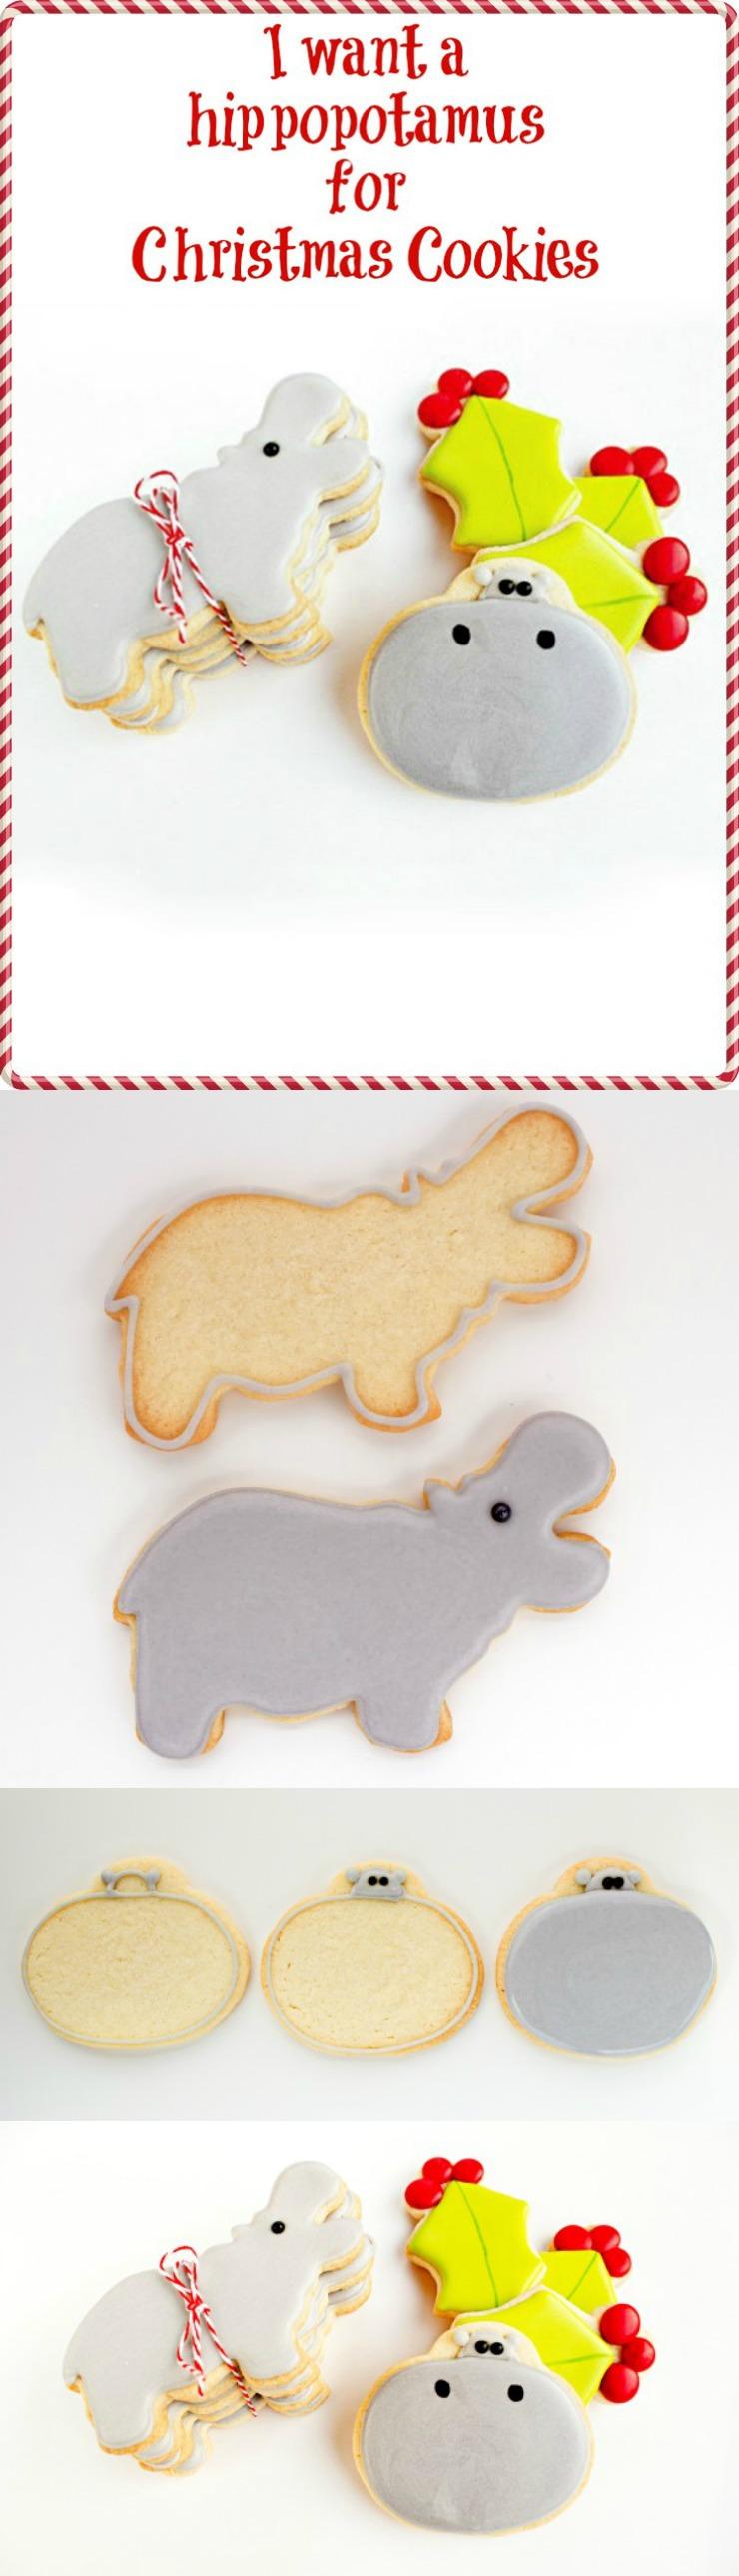 i want a hippopotamus for christmas cookies the bearfoot baker - All I Want For Christmas Is A Hippopotamus Ringtone